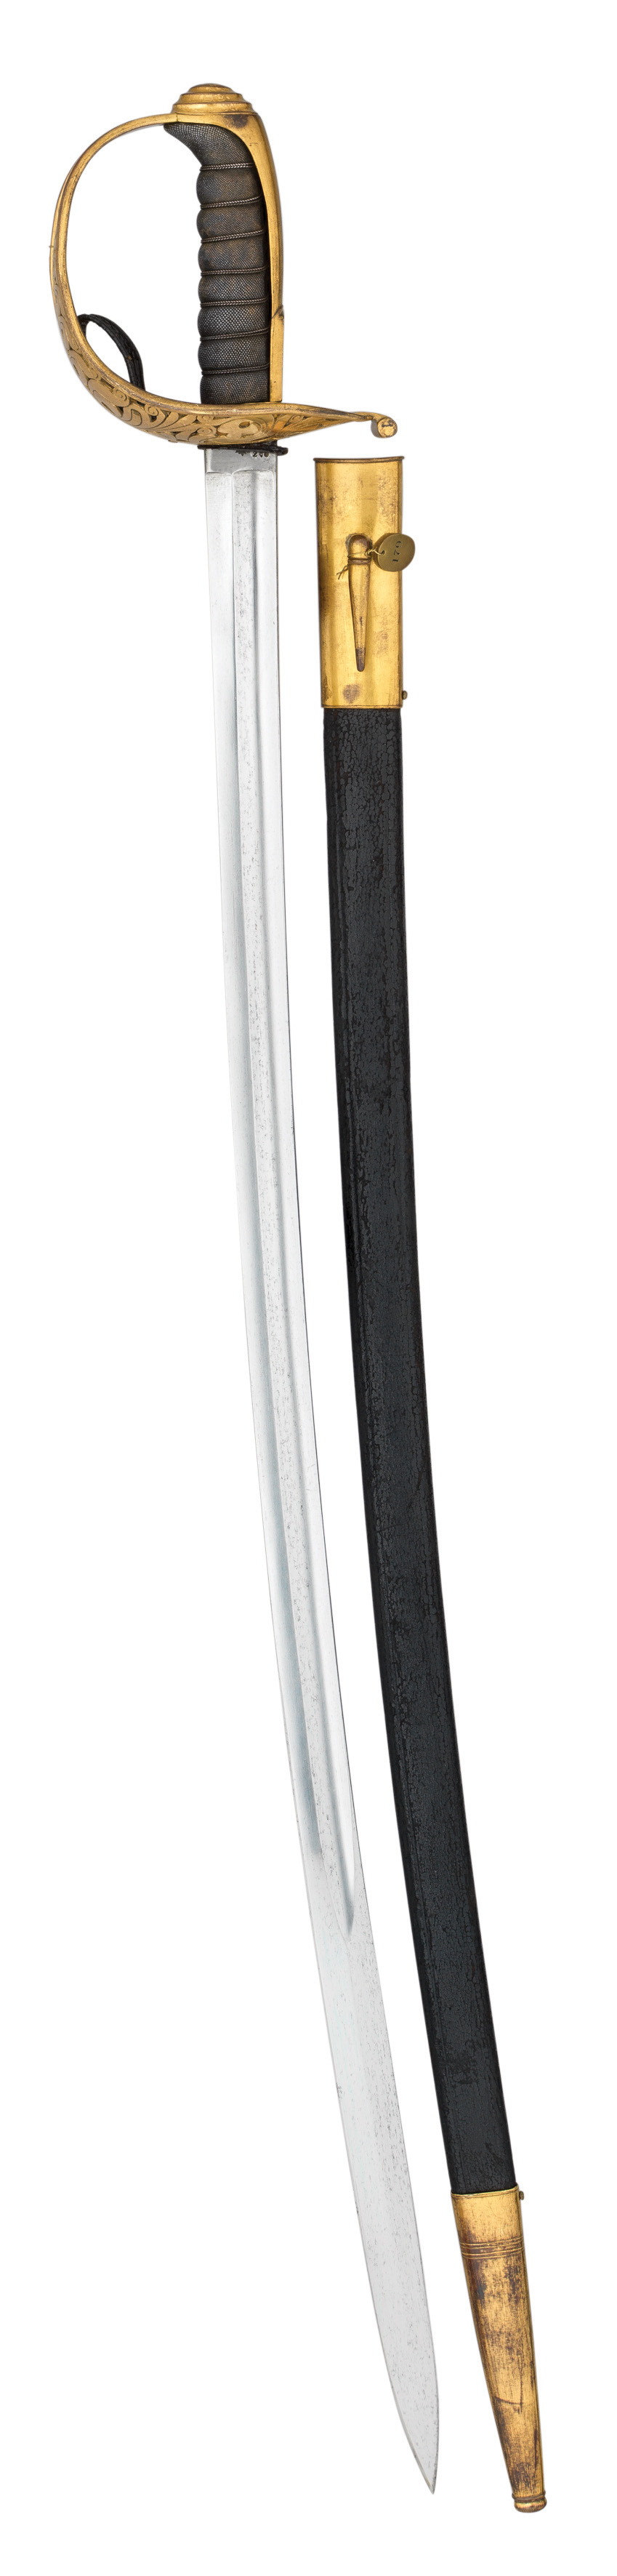 ‡ A GILT AUSTRIAN MODEL 1869 CAVALRY OFFICER'S SWORD^ CIRCA 1870